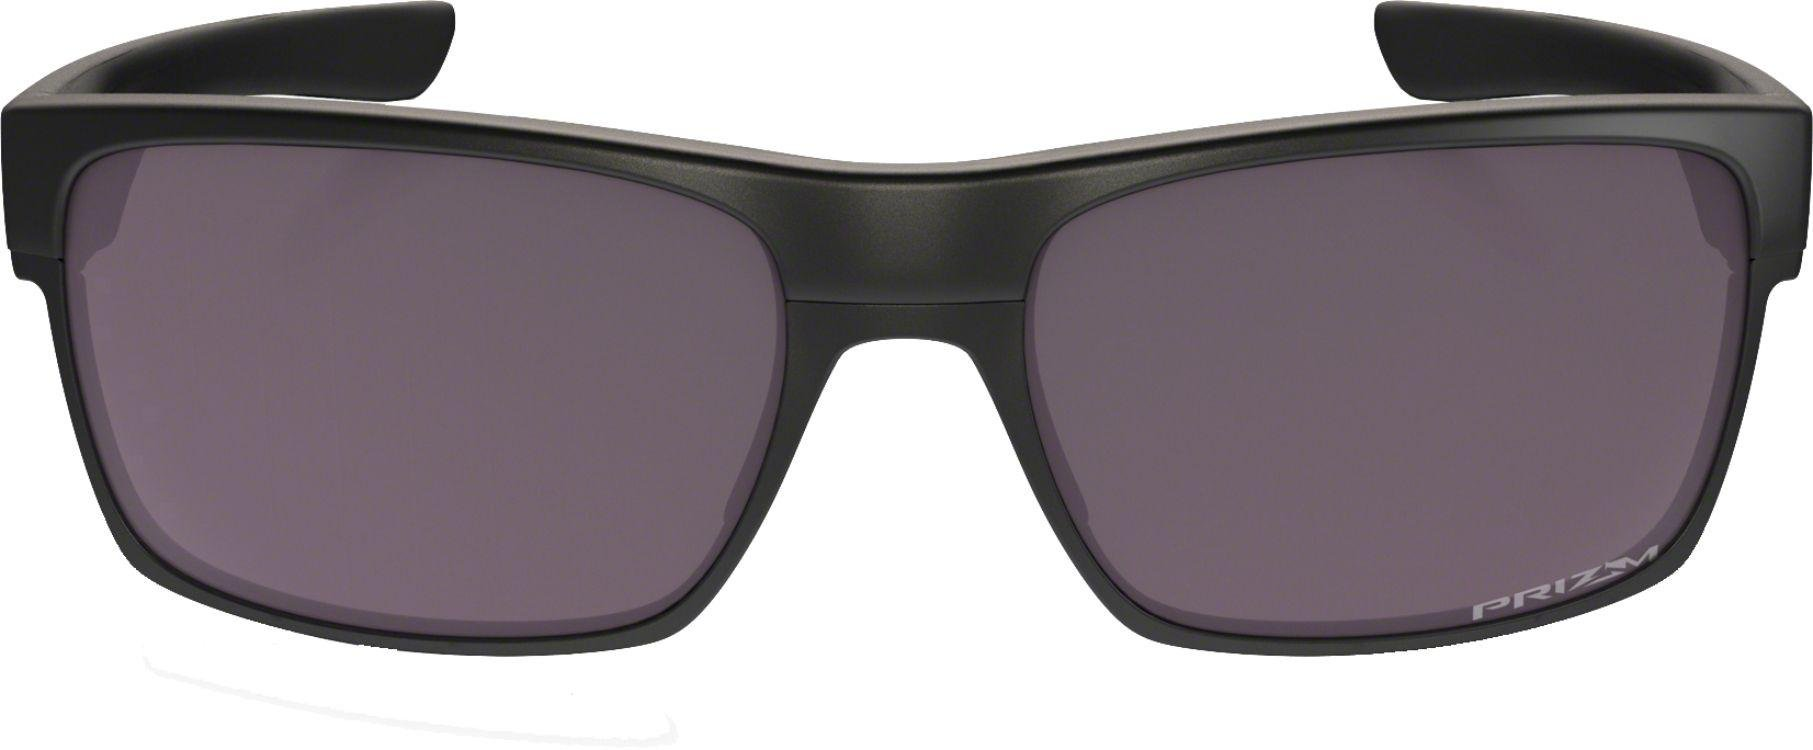 8217920eb8 Oakley - Black Prizm Daily Polarized Twoface Covert Sunglasses for Men -  Lyst. View fullscreen